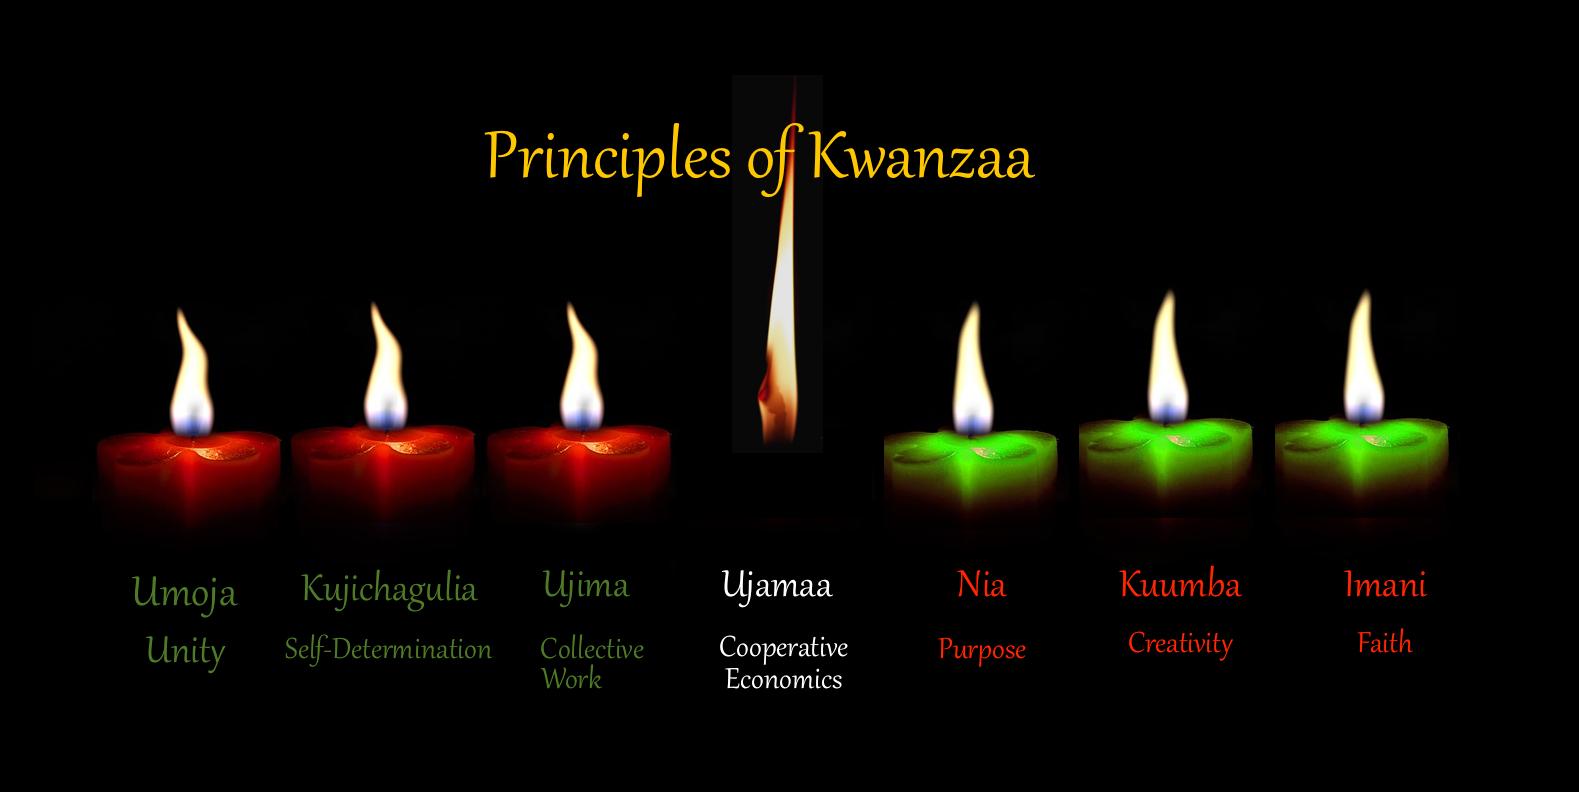 The Principles of Kwanzaa